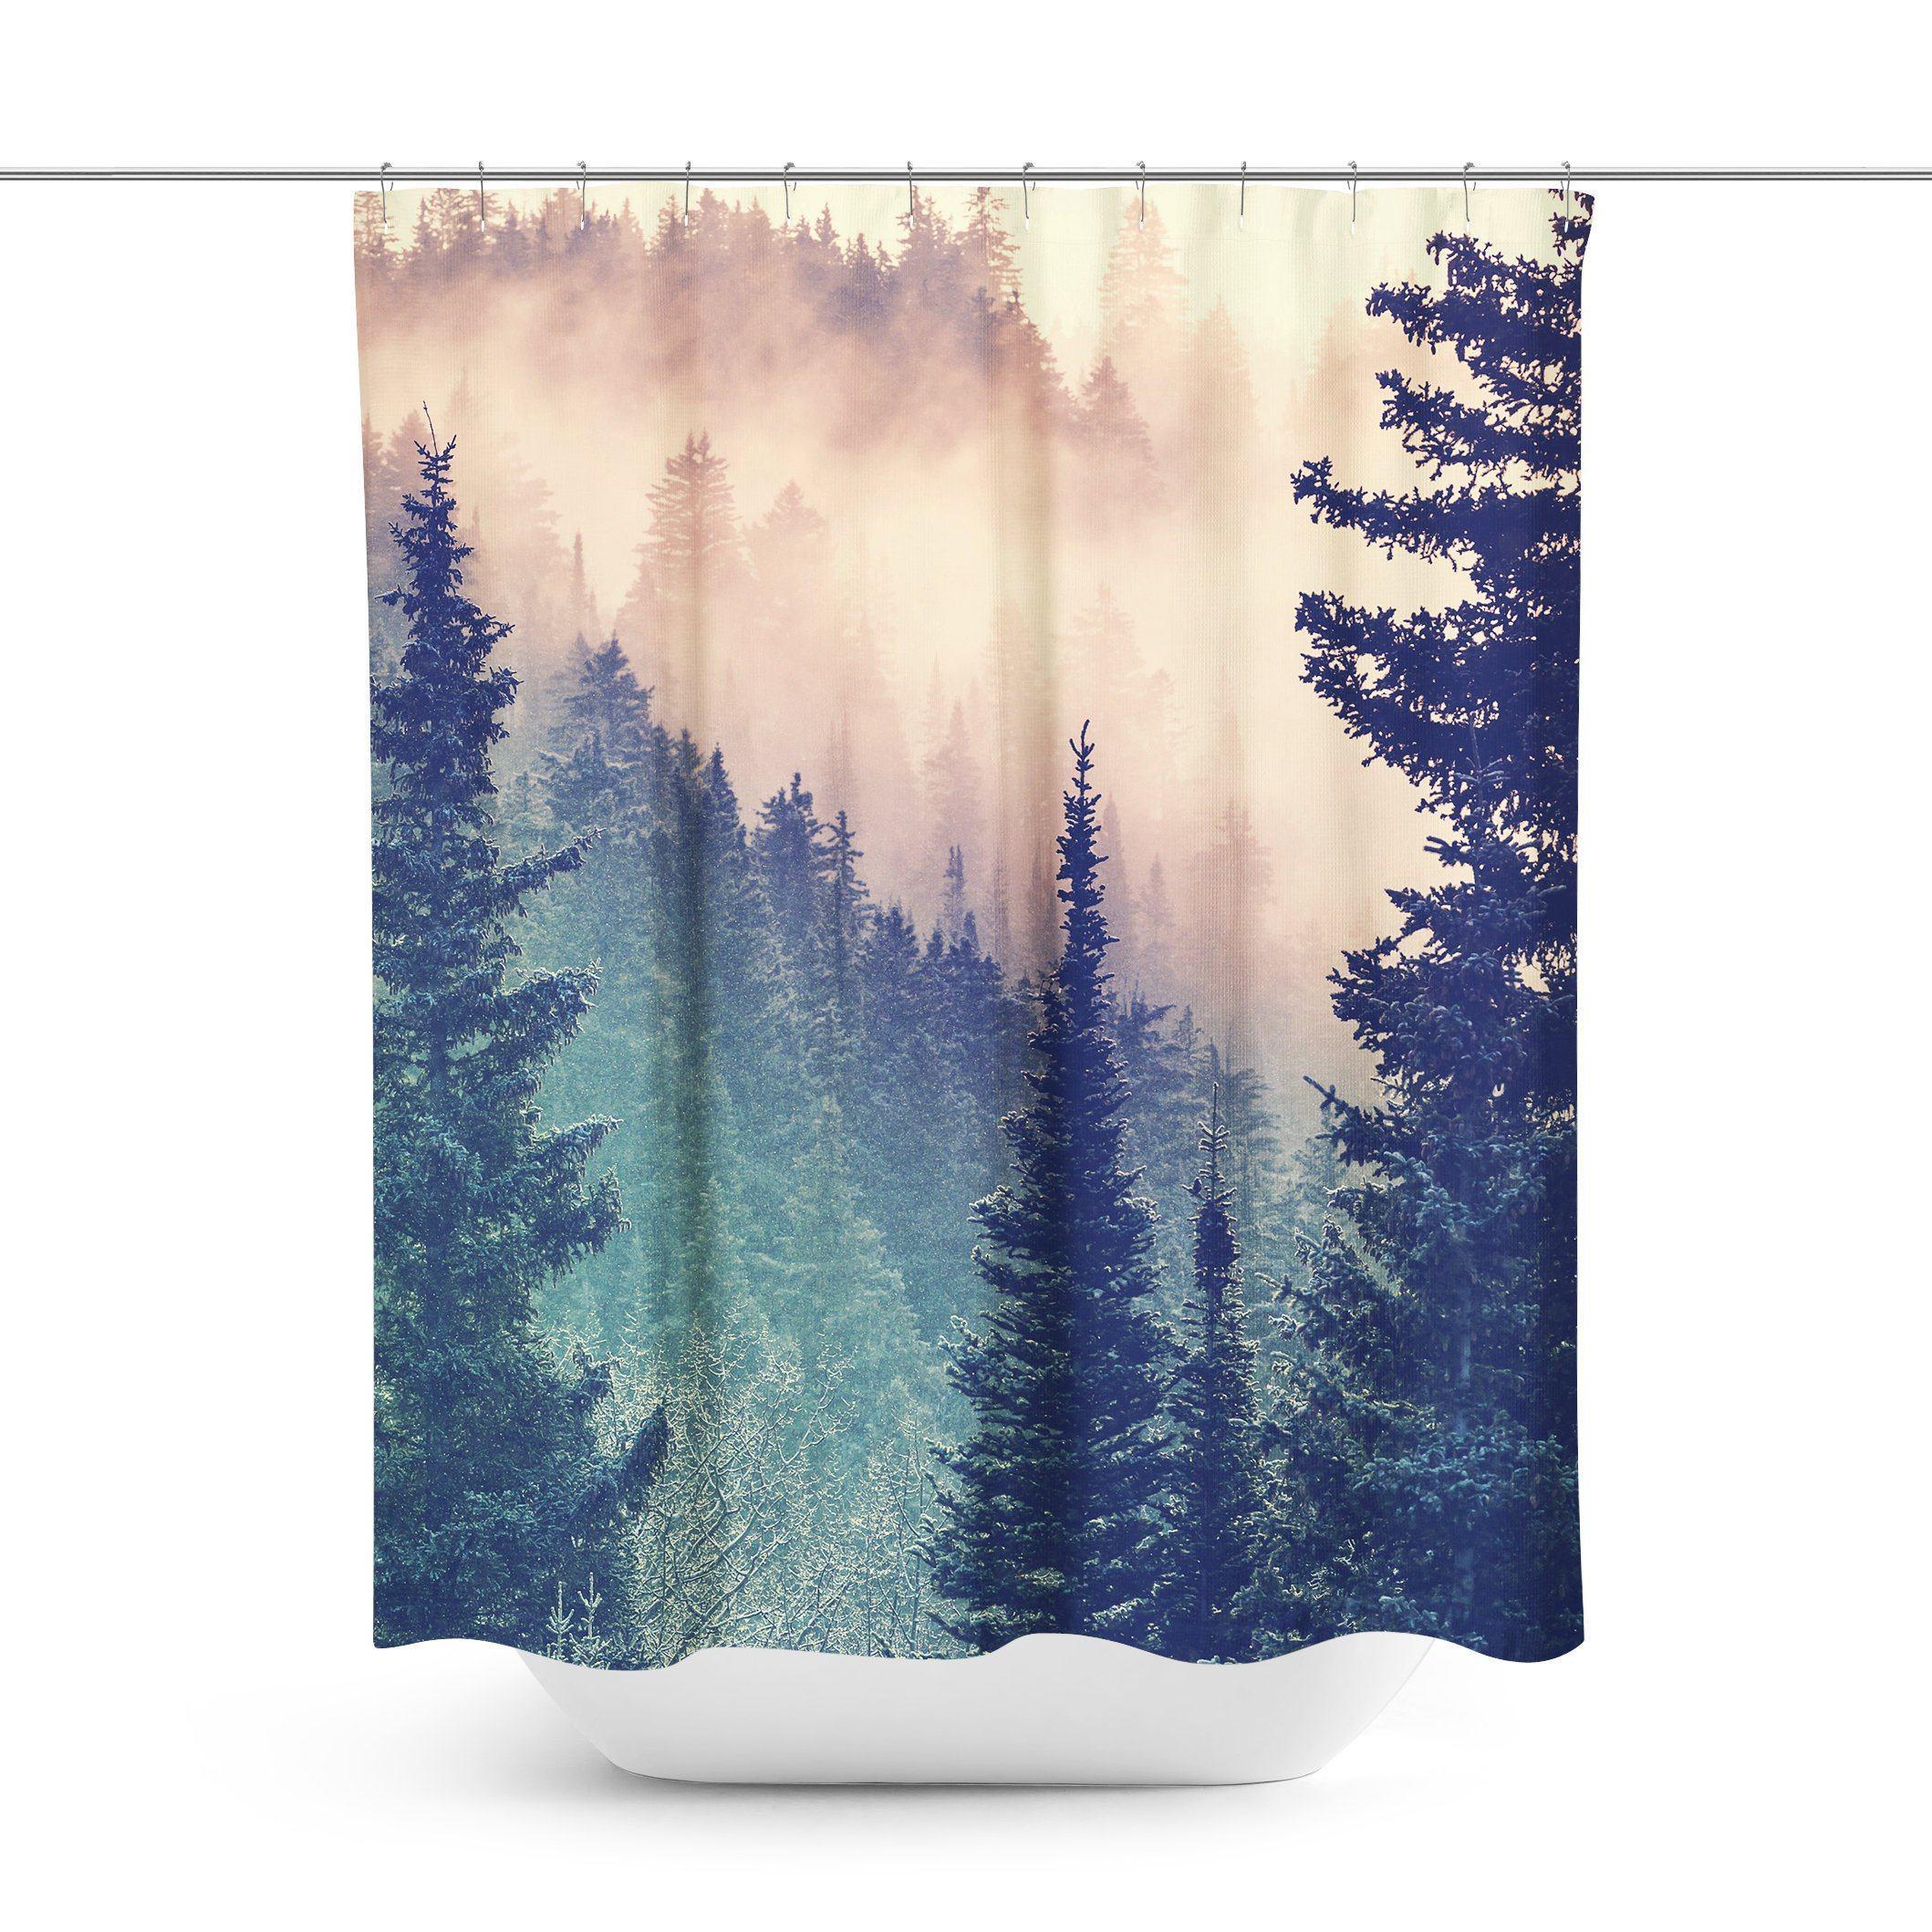 Wilderness Forest Shower Curtain Curtains Curtain Shop Modern